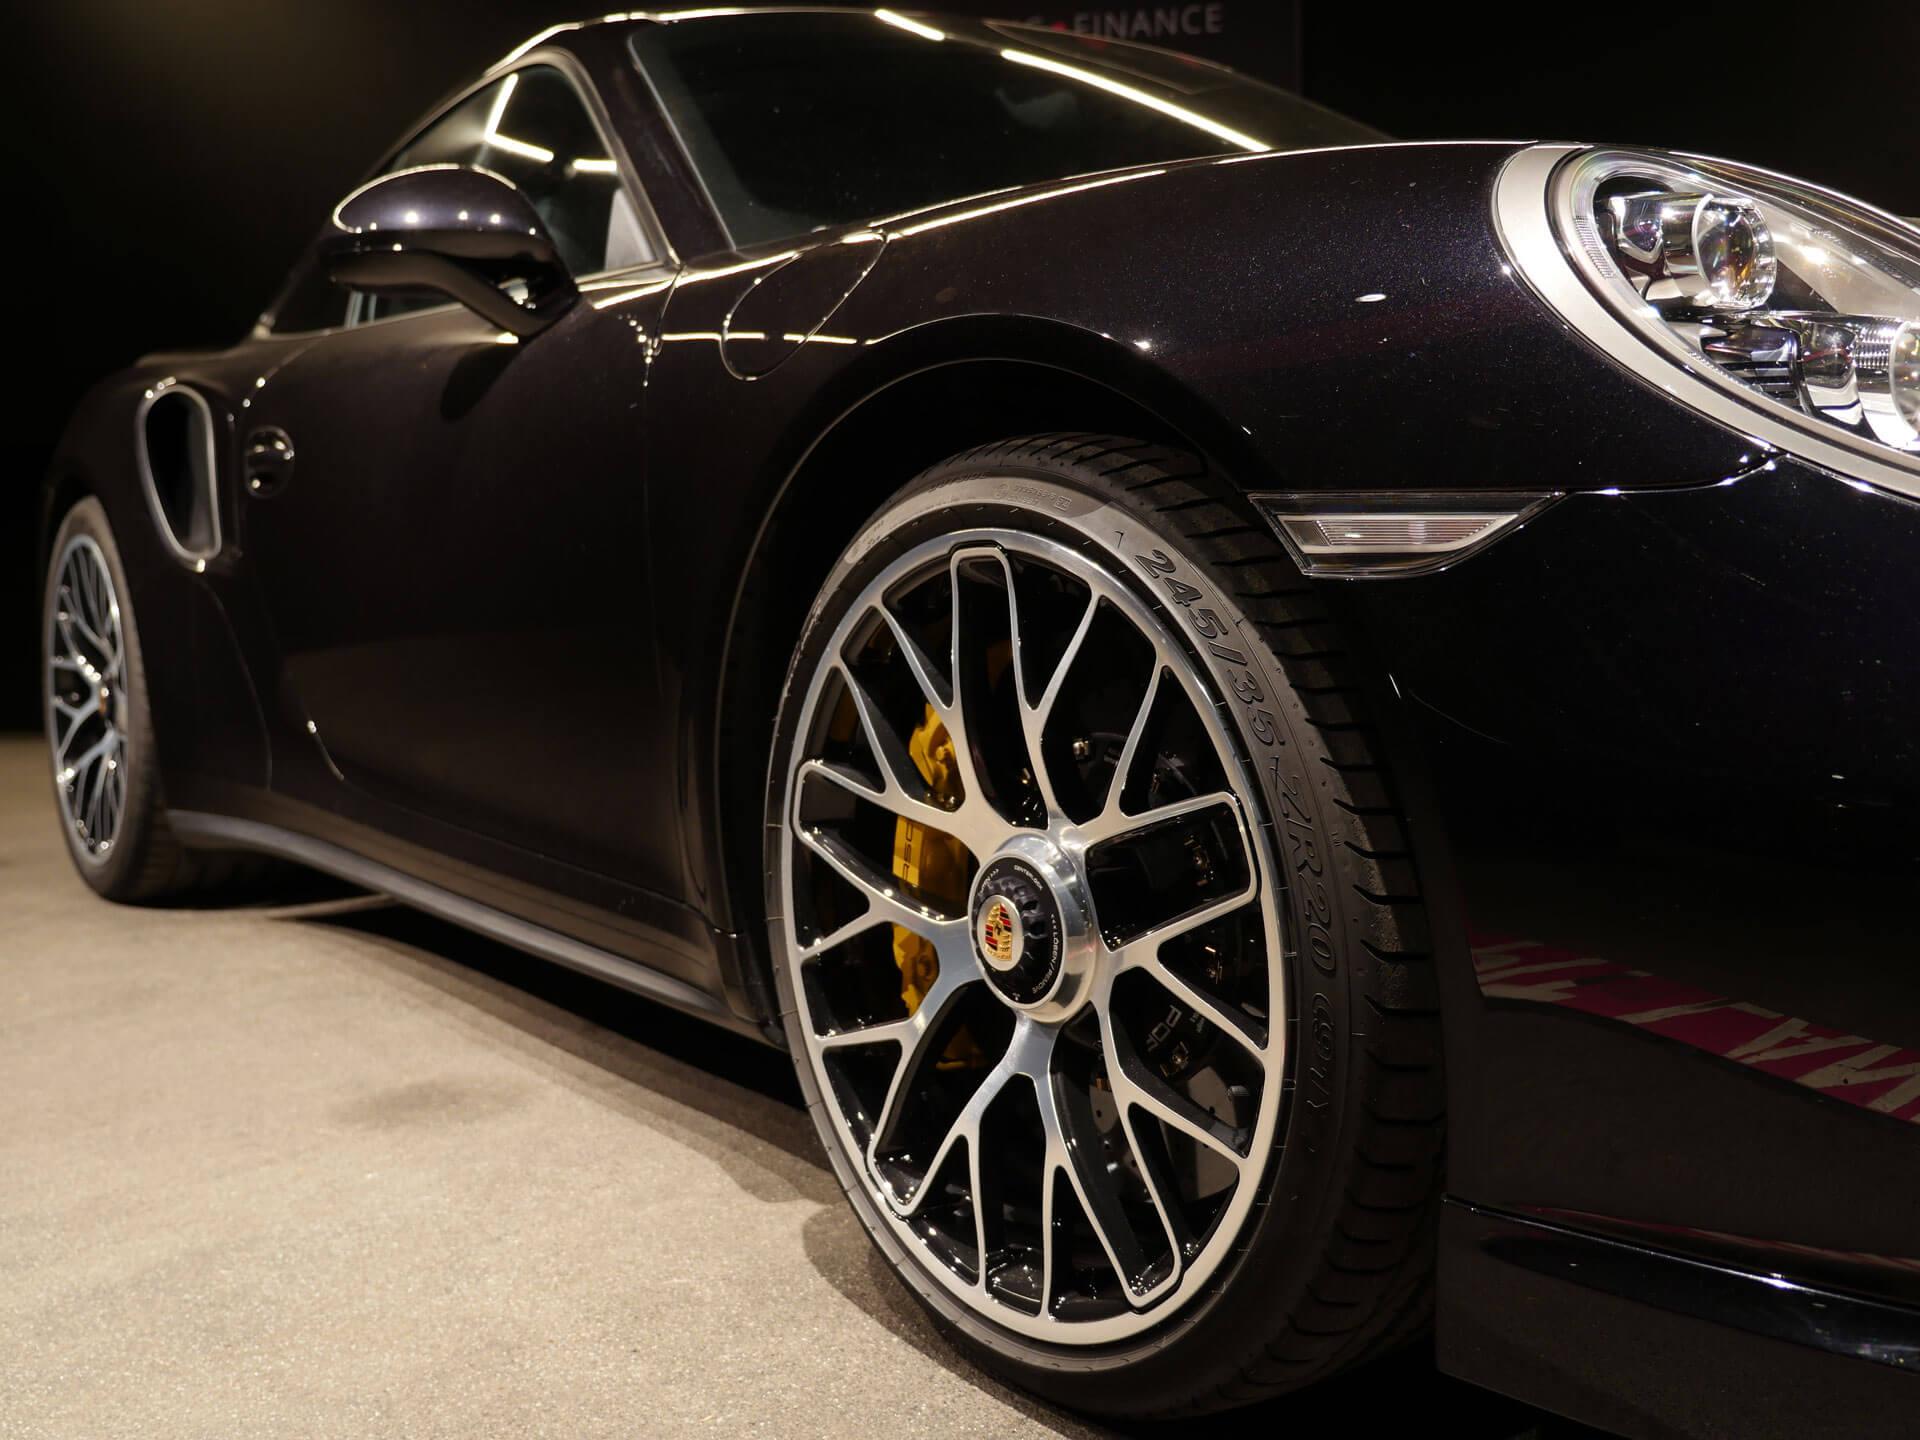 AIL Porsche 911 991 Turbo S Ceramic LED Sport Chrono Paket 2